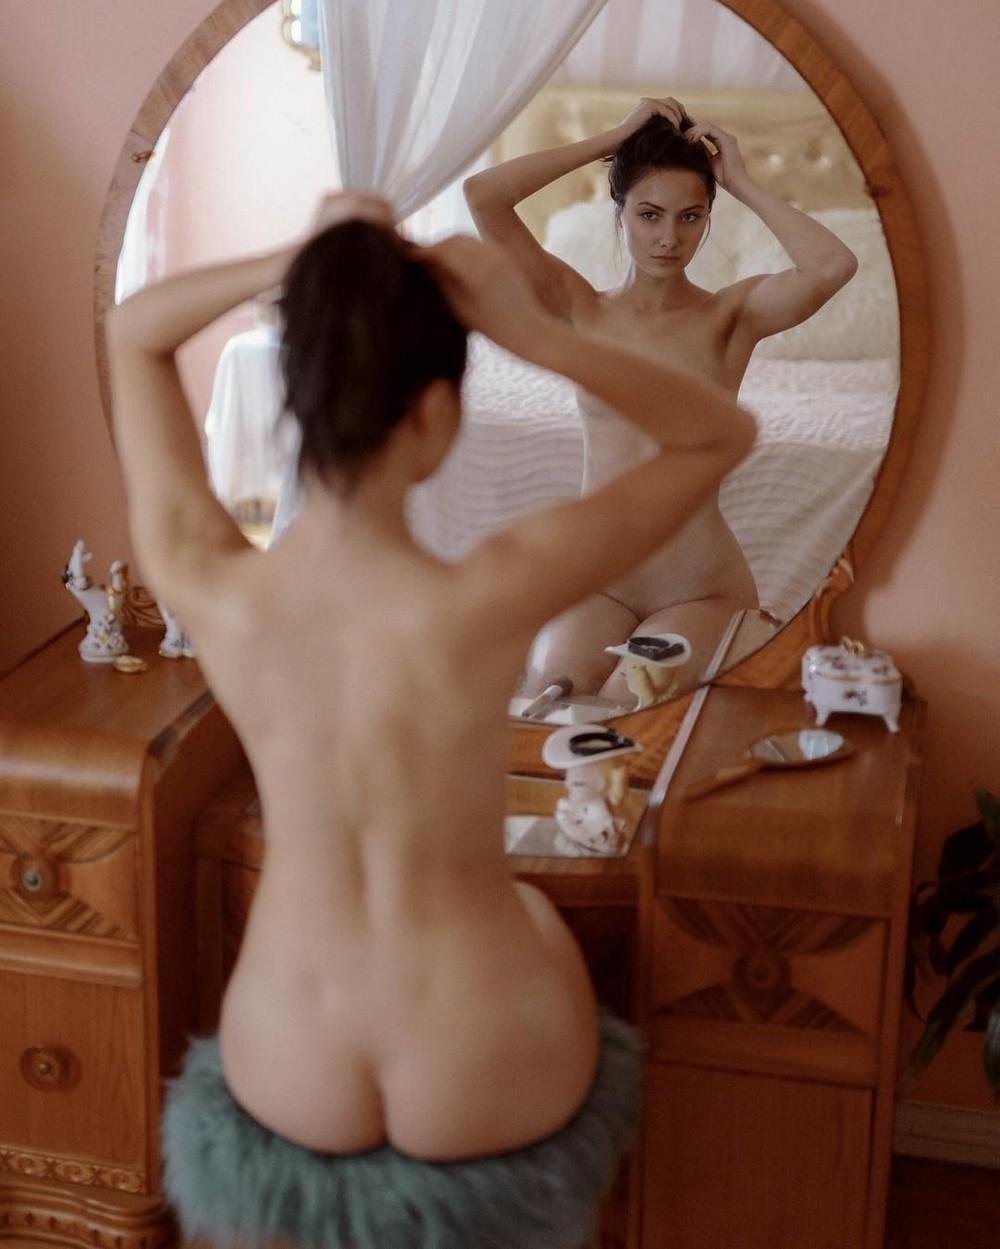 Чувственные снимки девушек от Натана Лобато